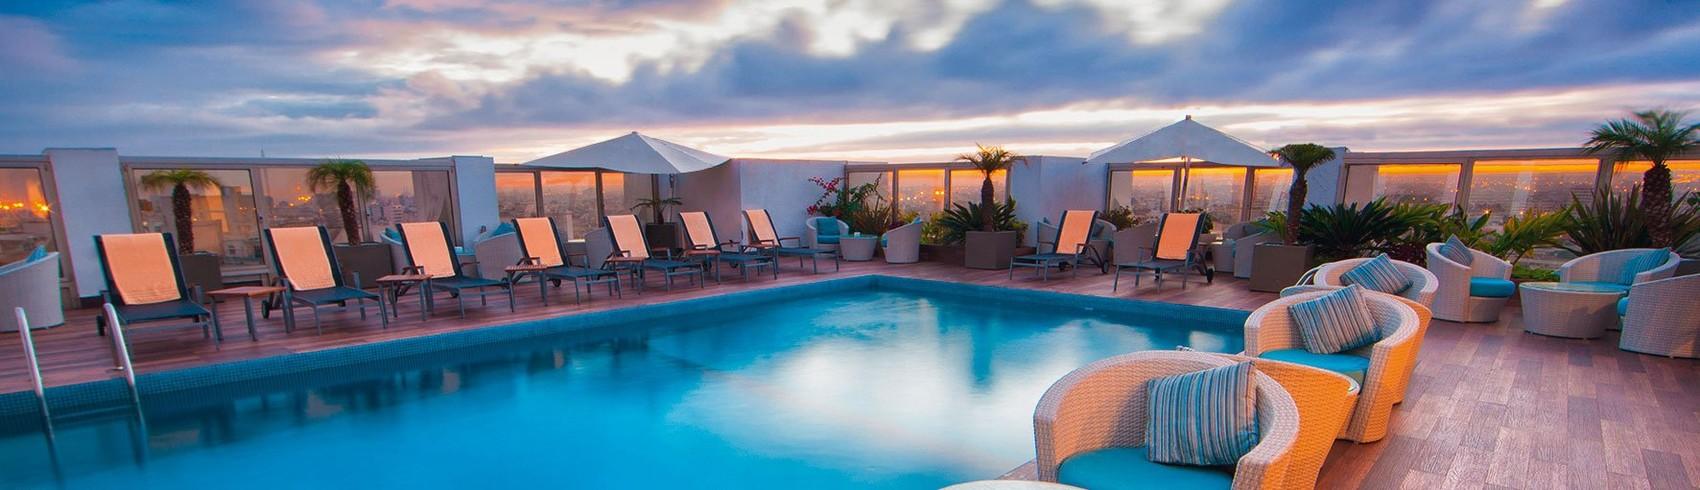 Reserva oferta de viaje o vacaciones en Hotel MOVENPICK PLAZA